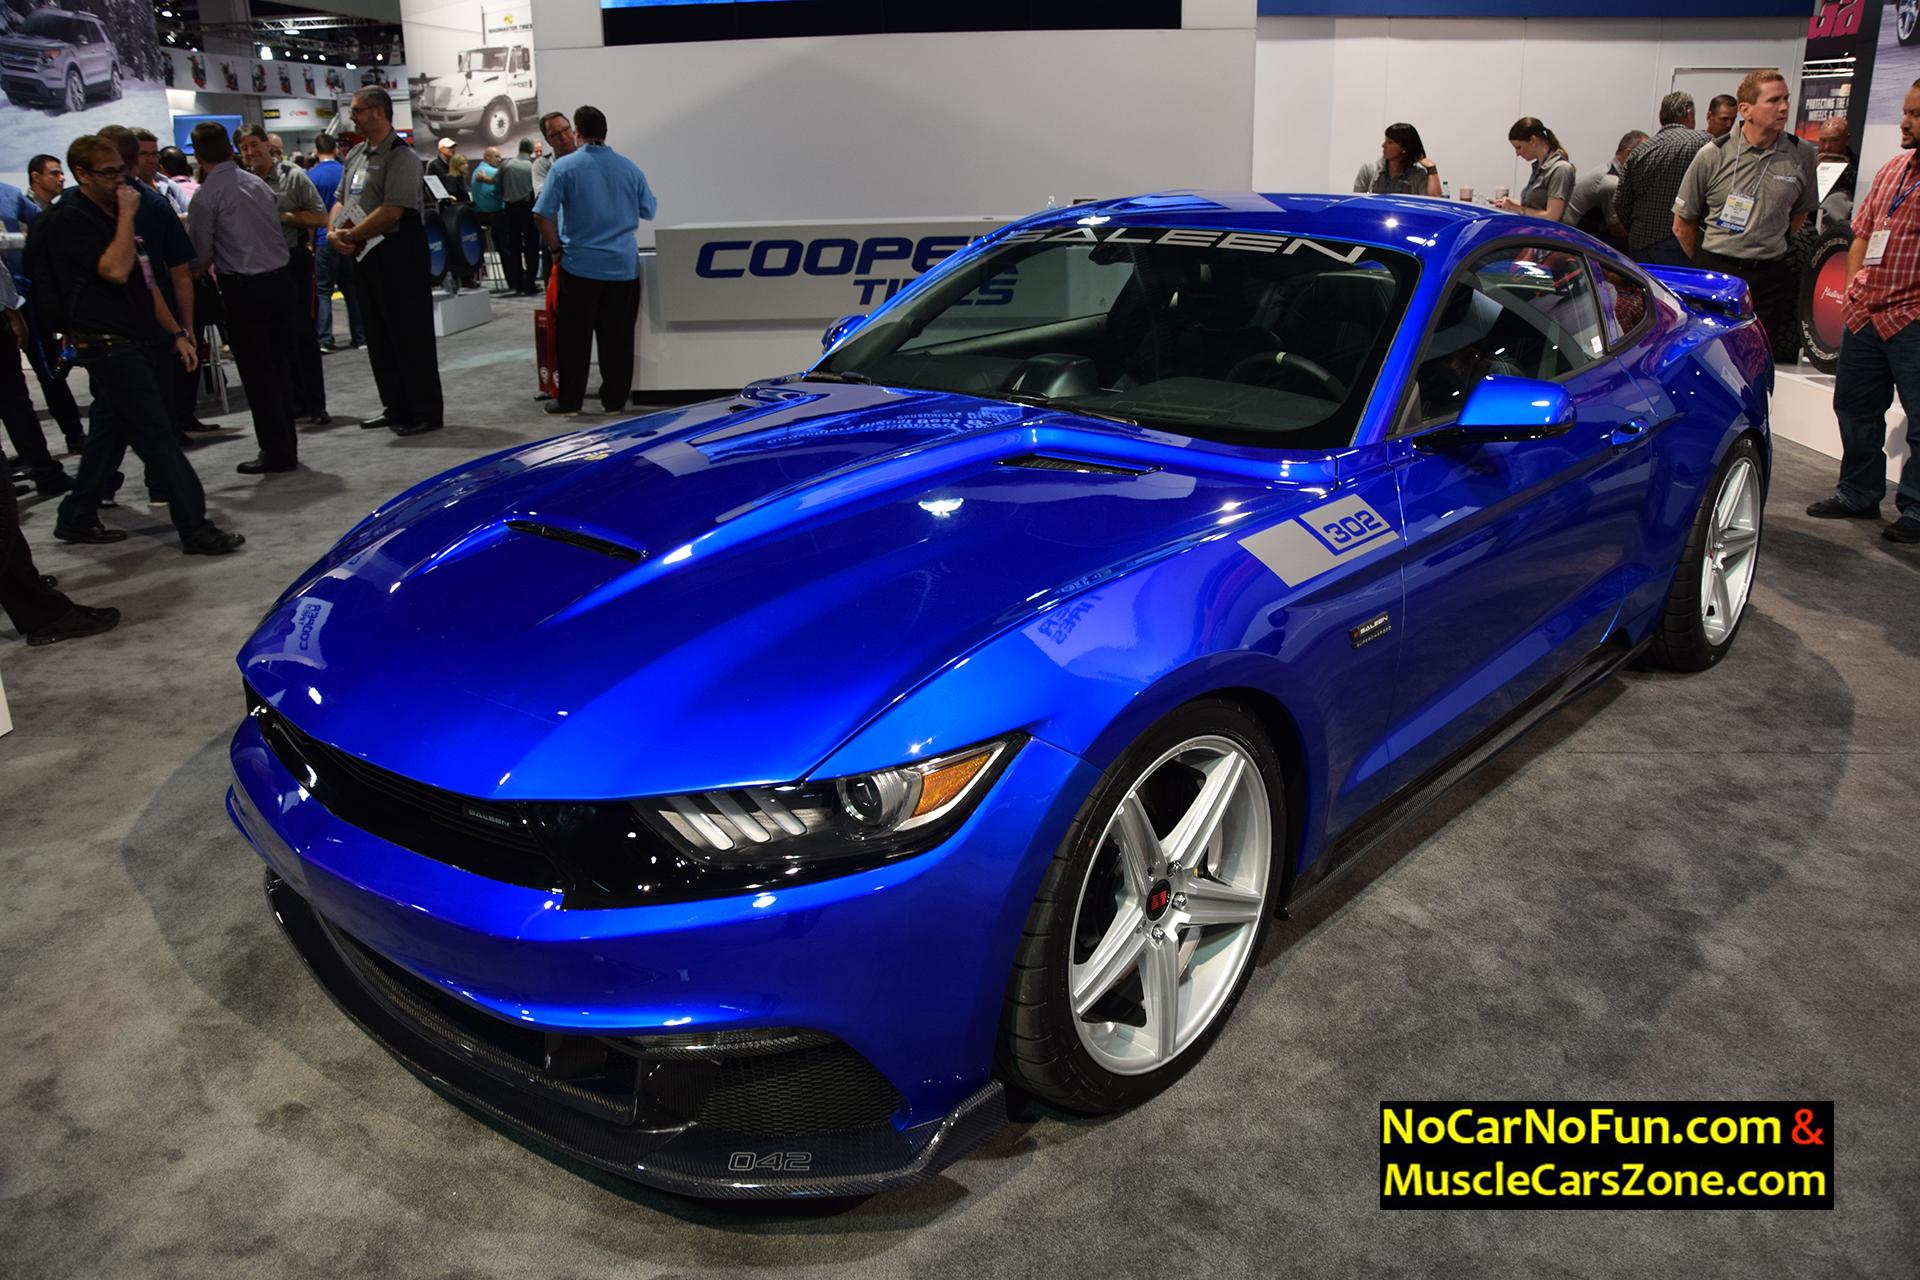 2015 Ford Mustang 302 Saleen Metallic Blue 2015 Sema